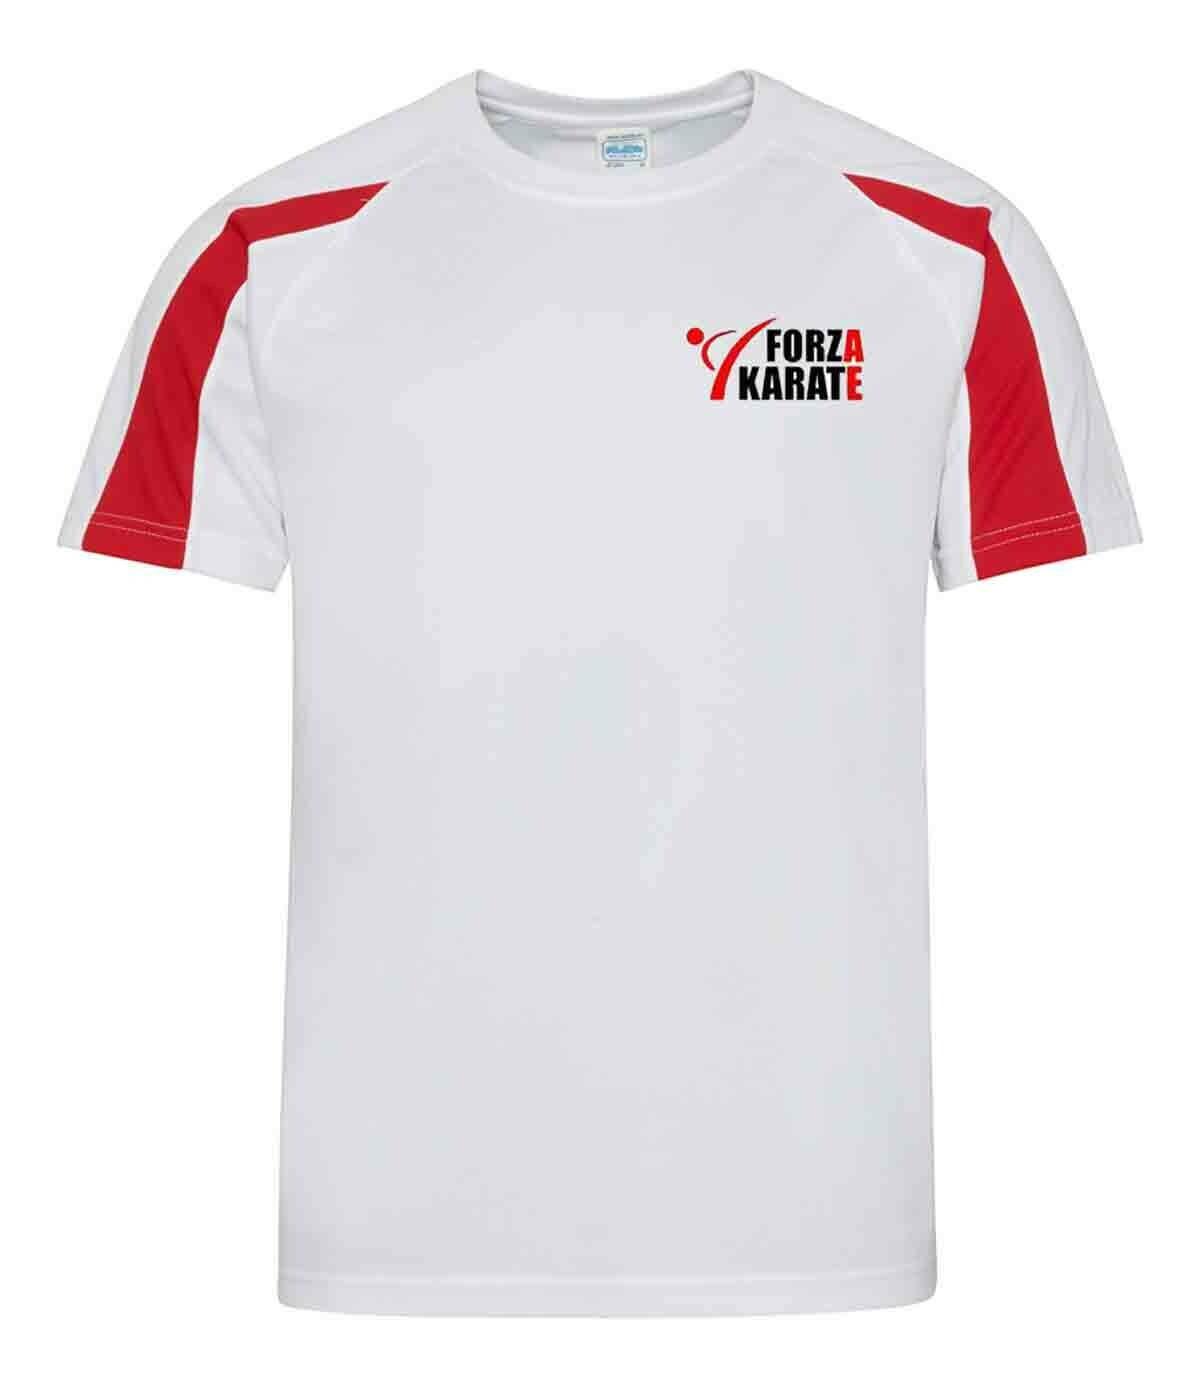 Official Forza Karate T-Shirt